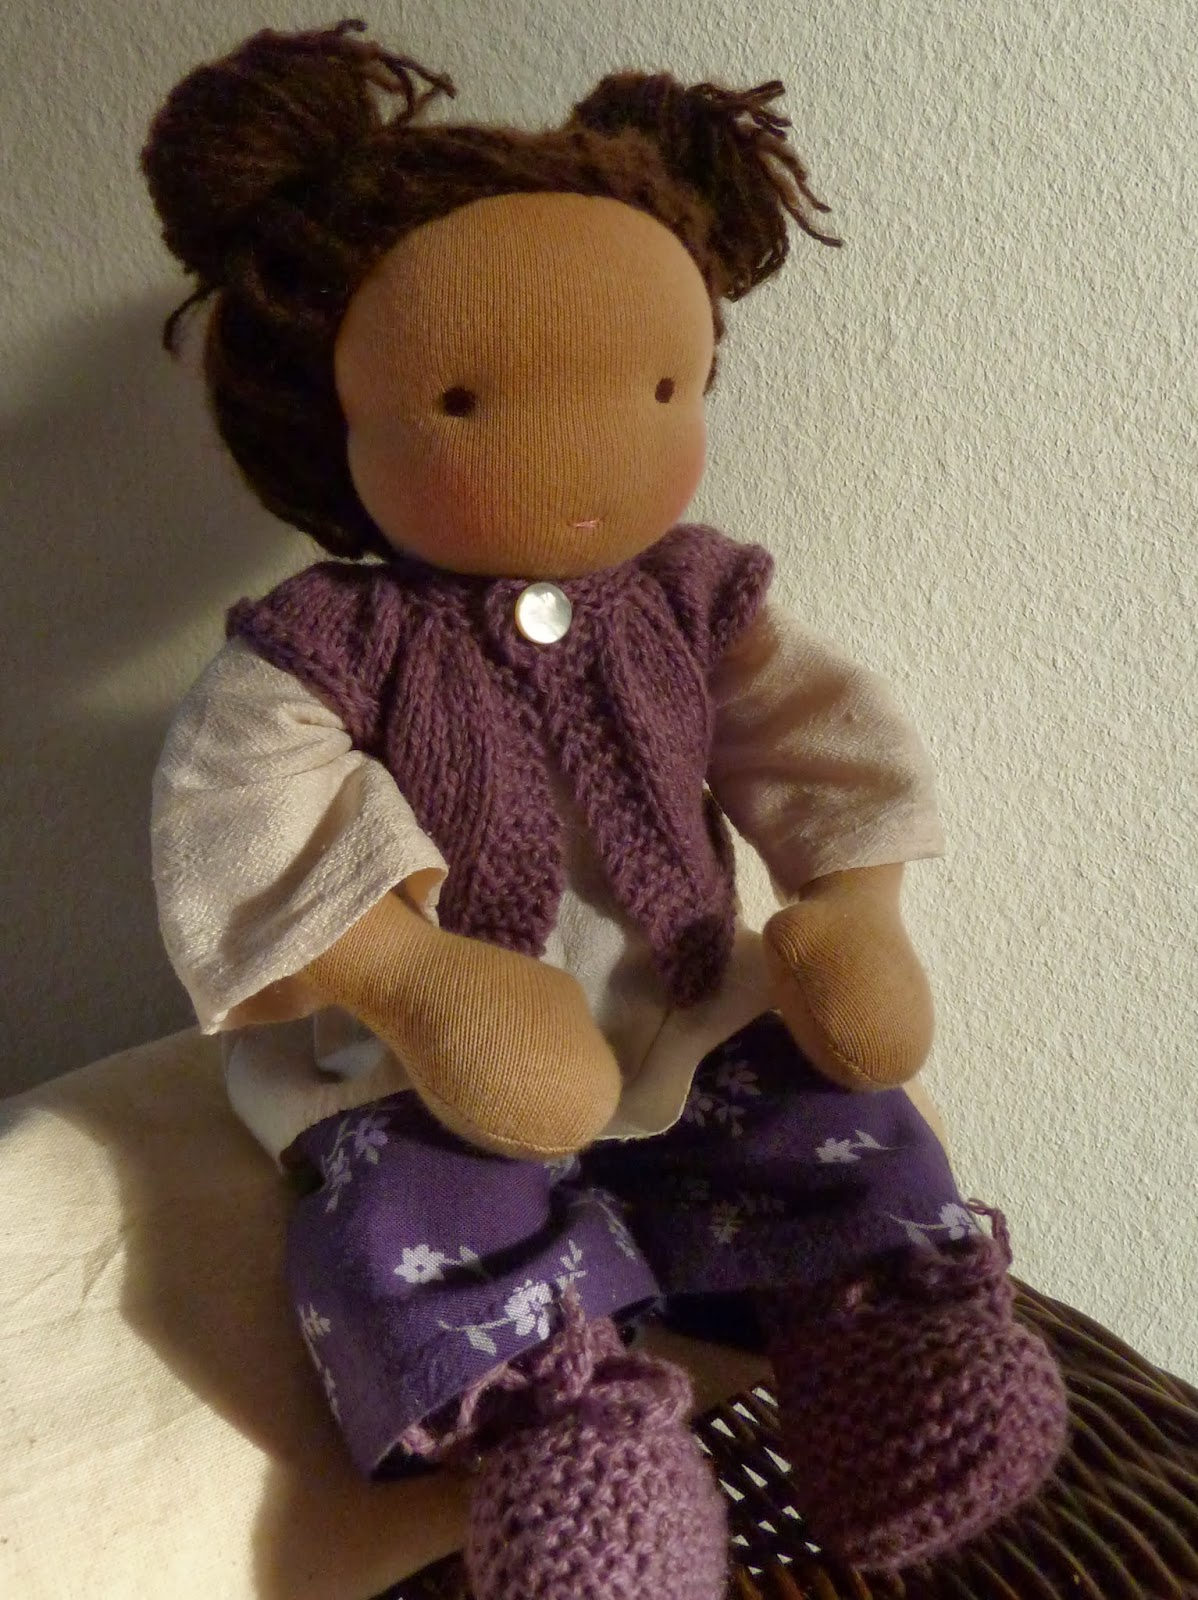 waldorfpuppe waldorf doll zauberflink